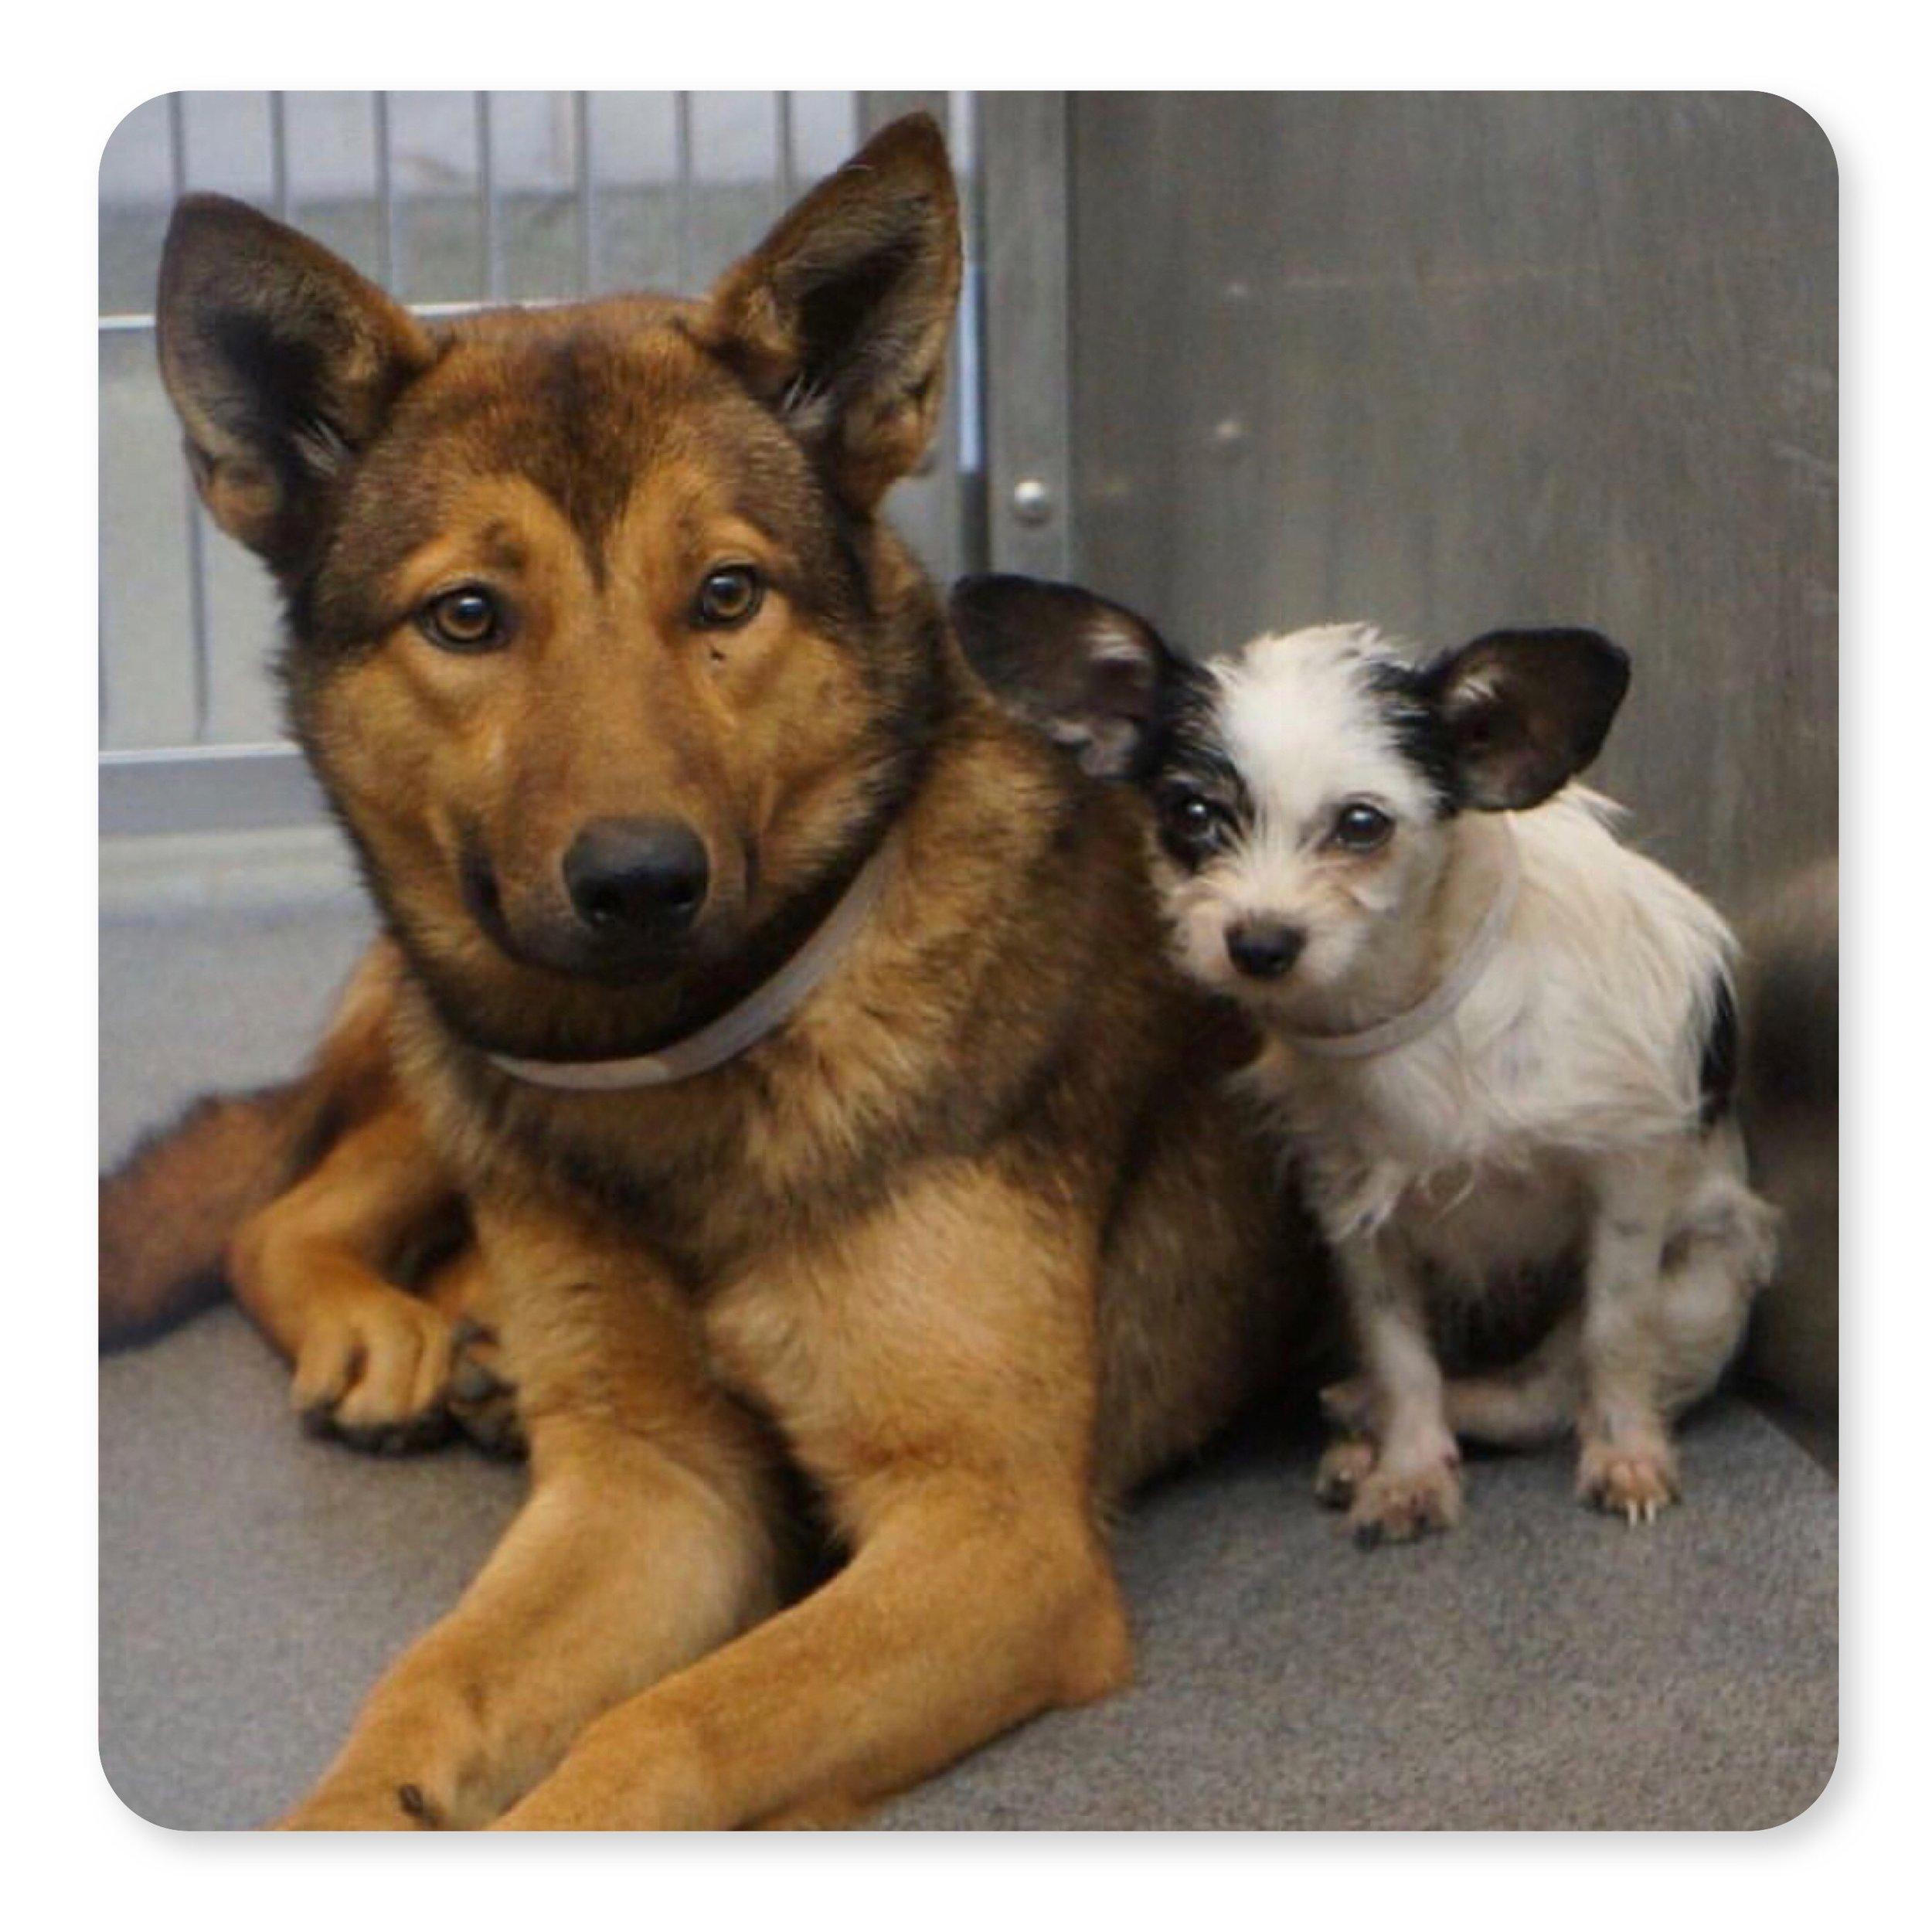 thestreetdogproject-galsbestfriend